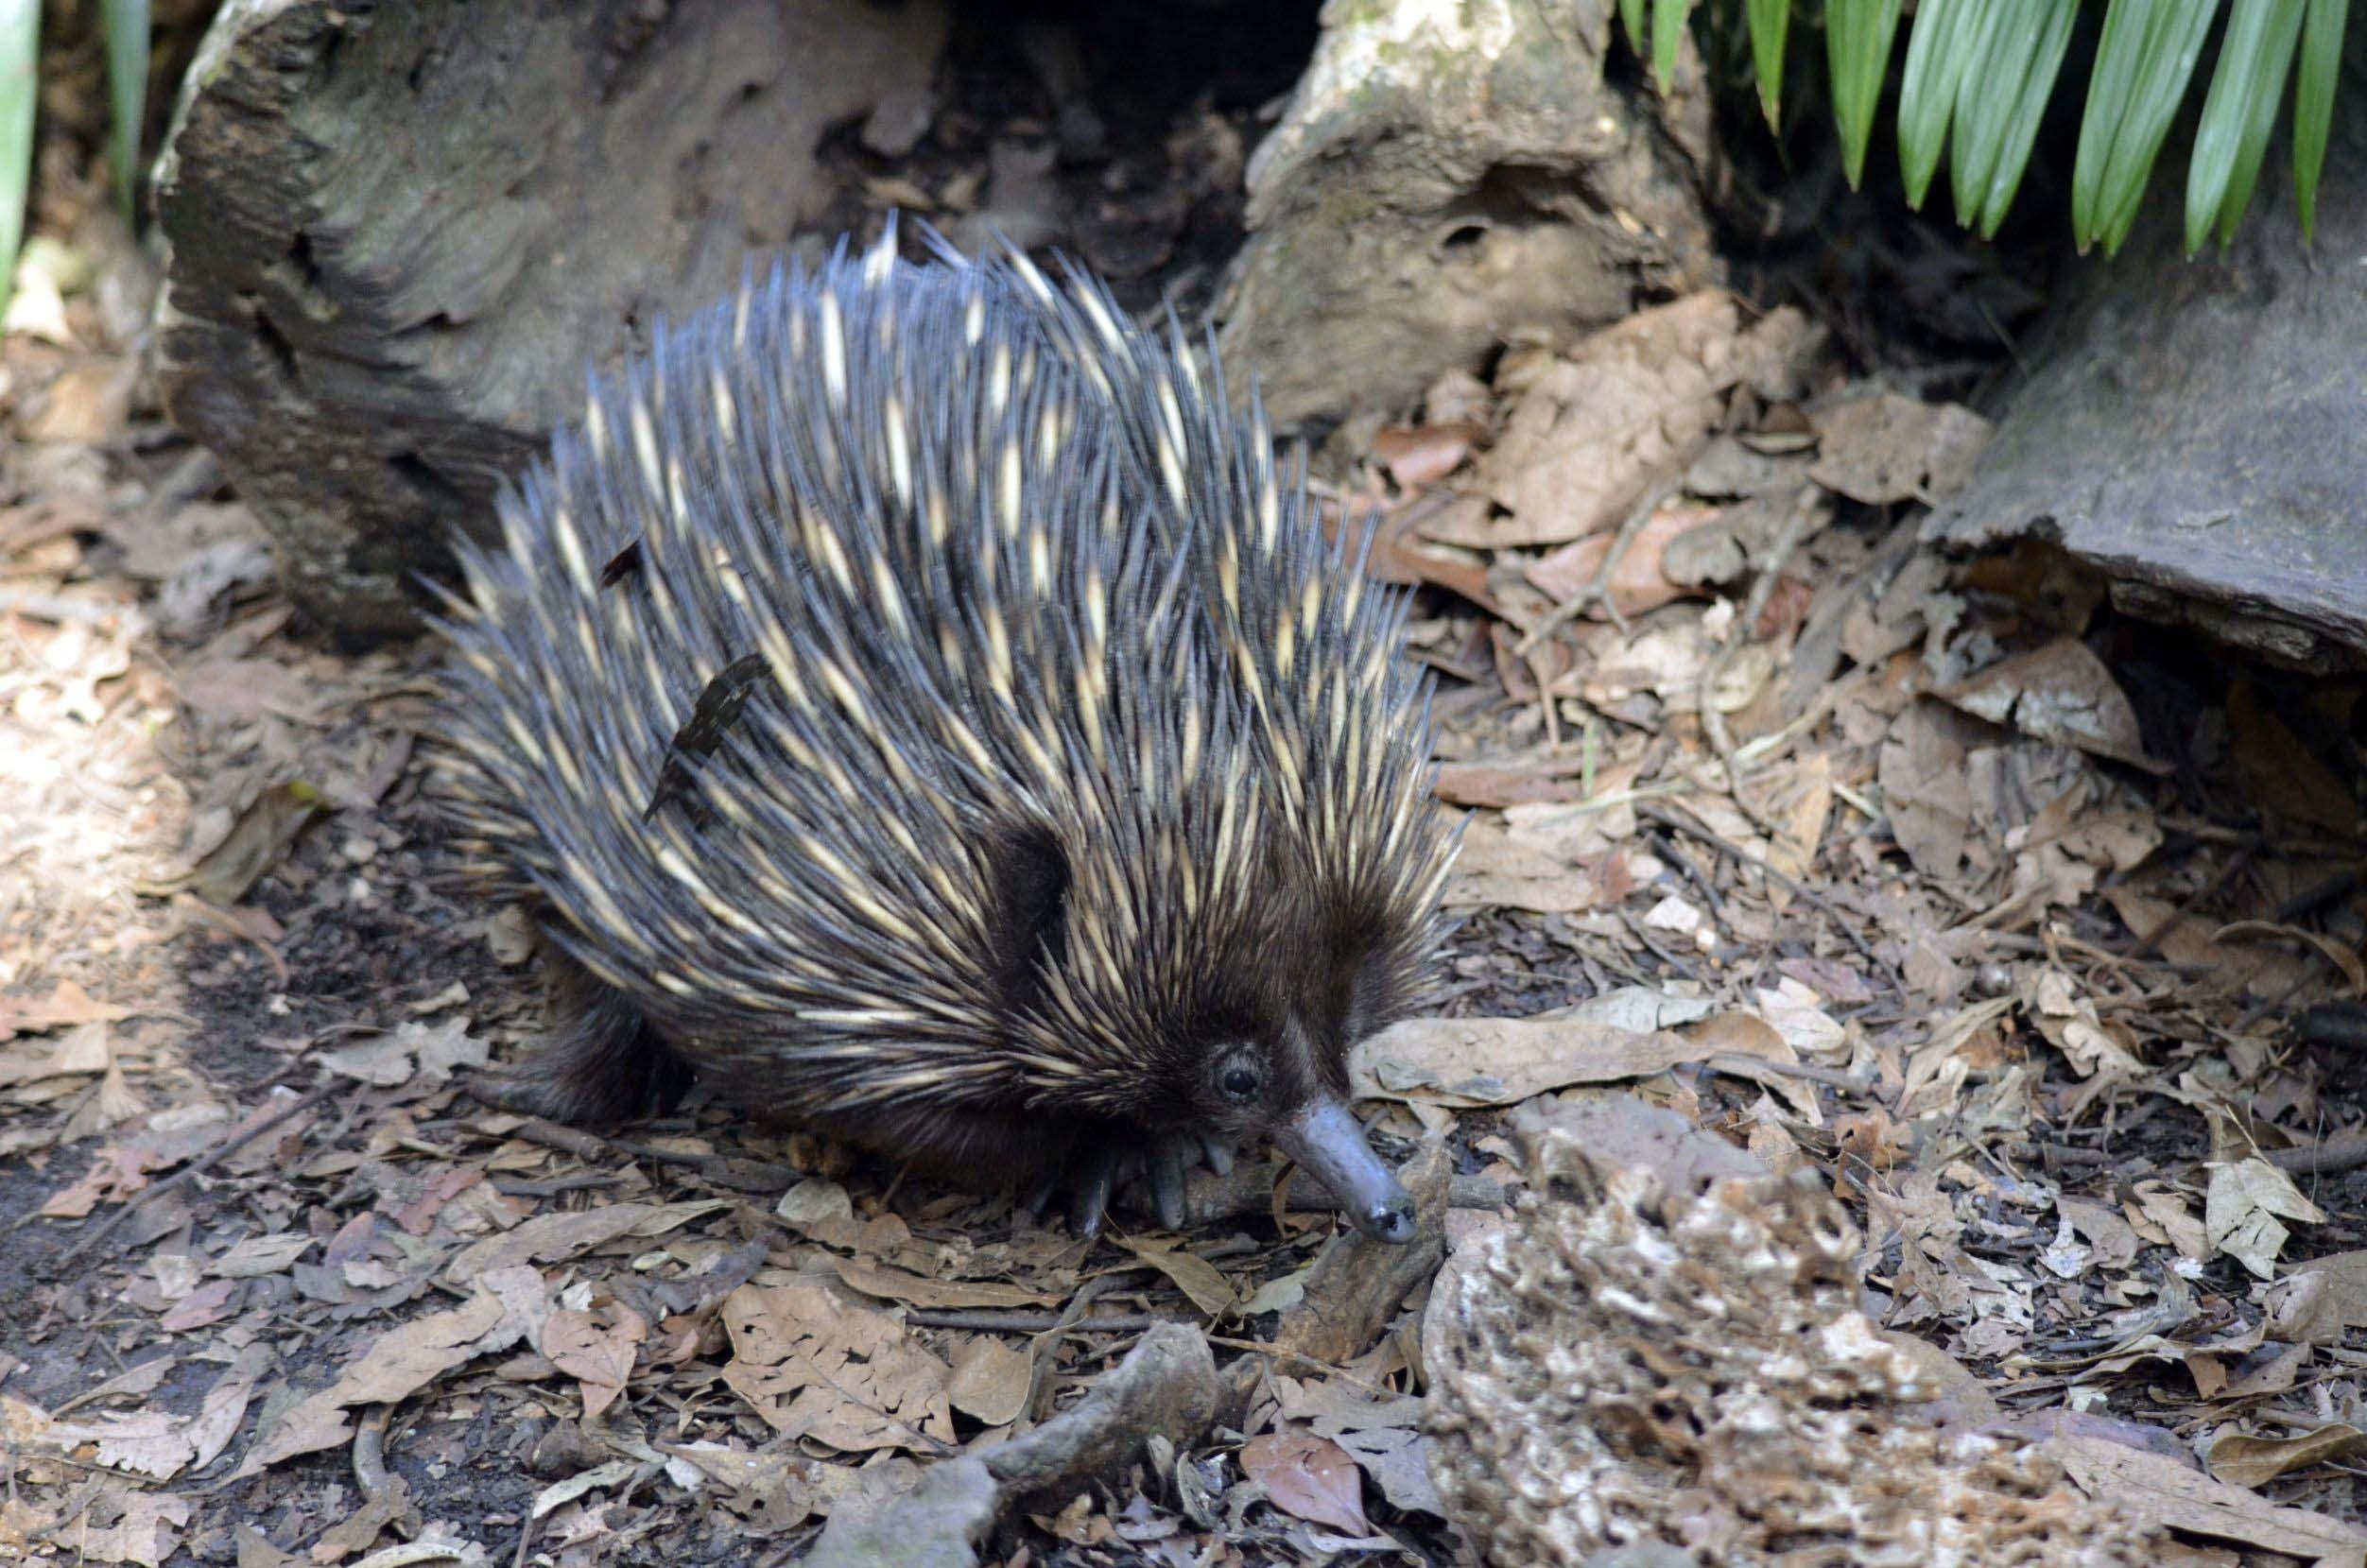 echidna-walking-on-bark-australia